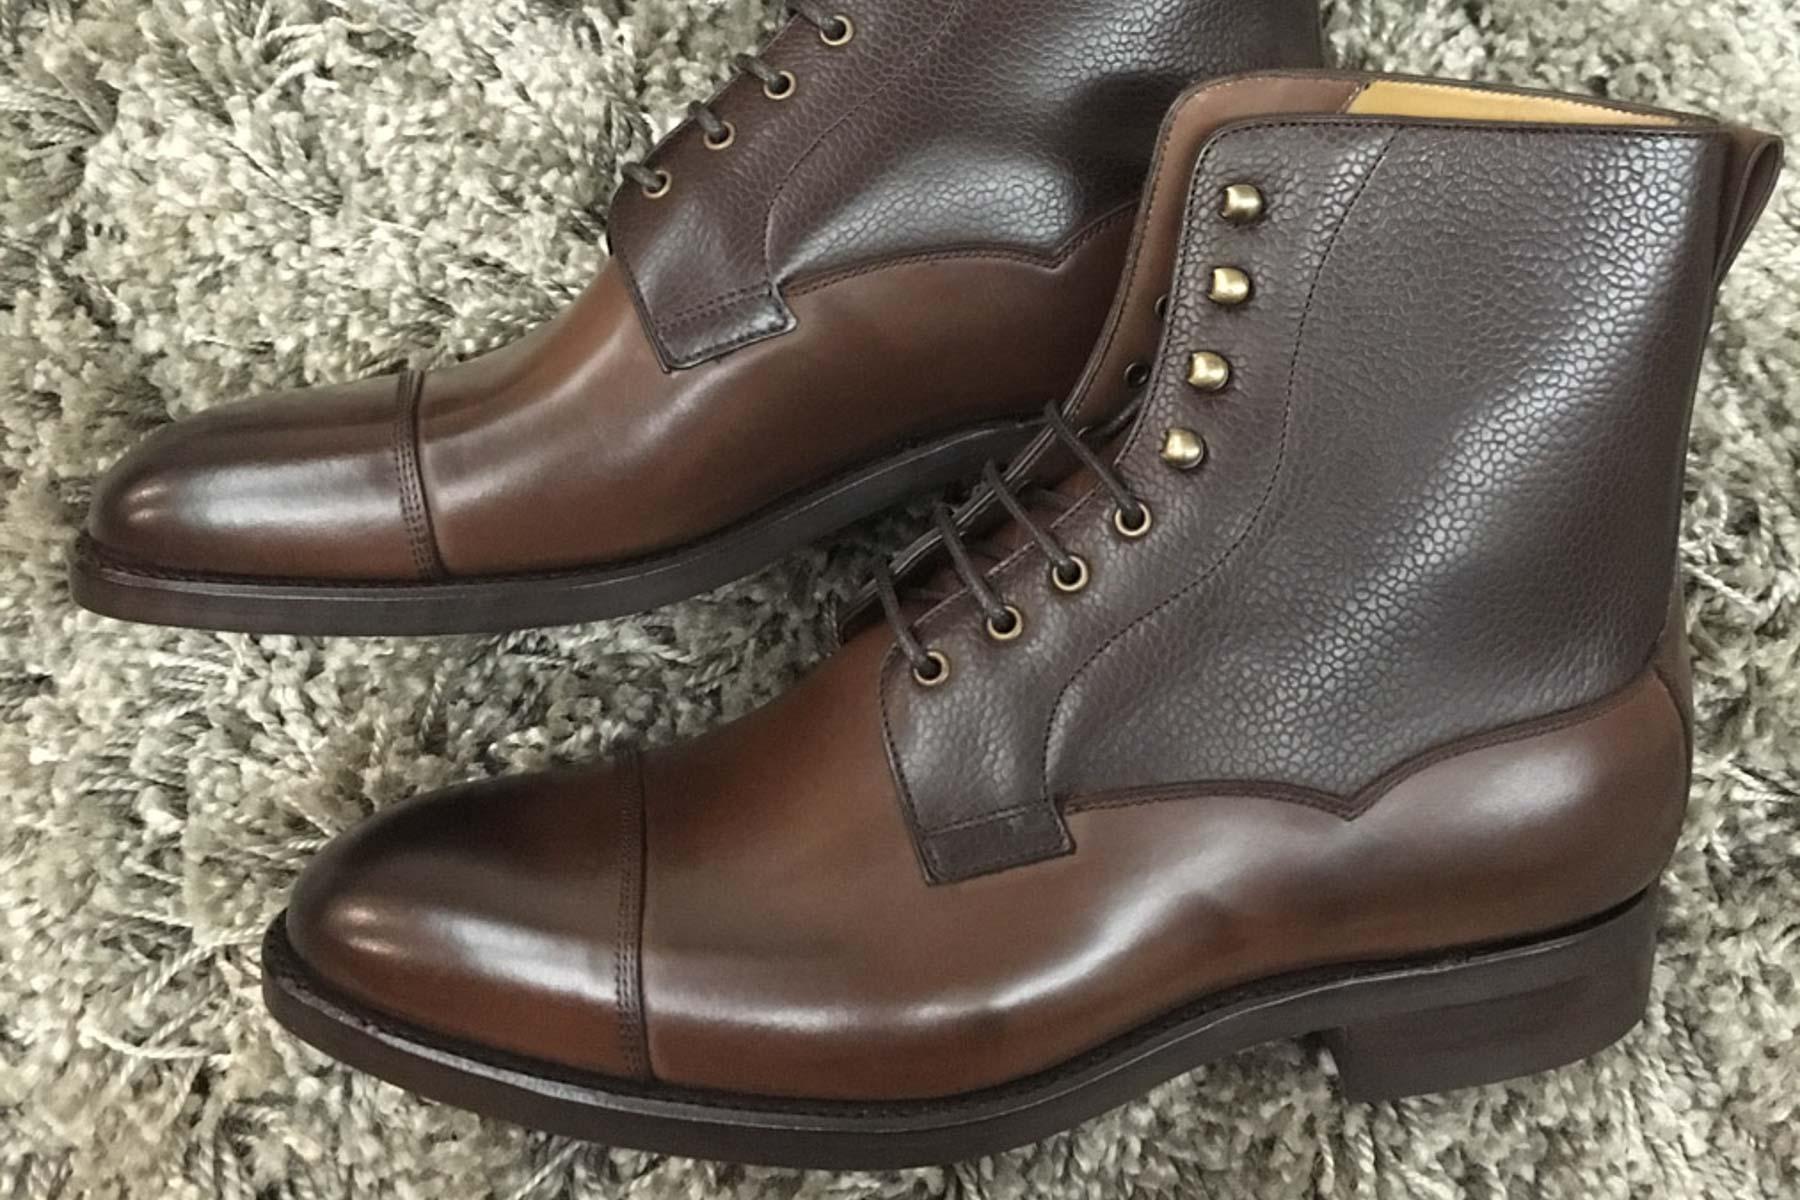 CS9156 GMTO The Noble Shoe